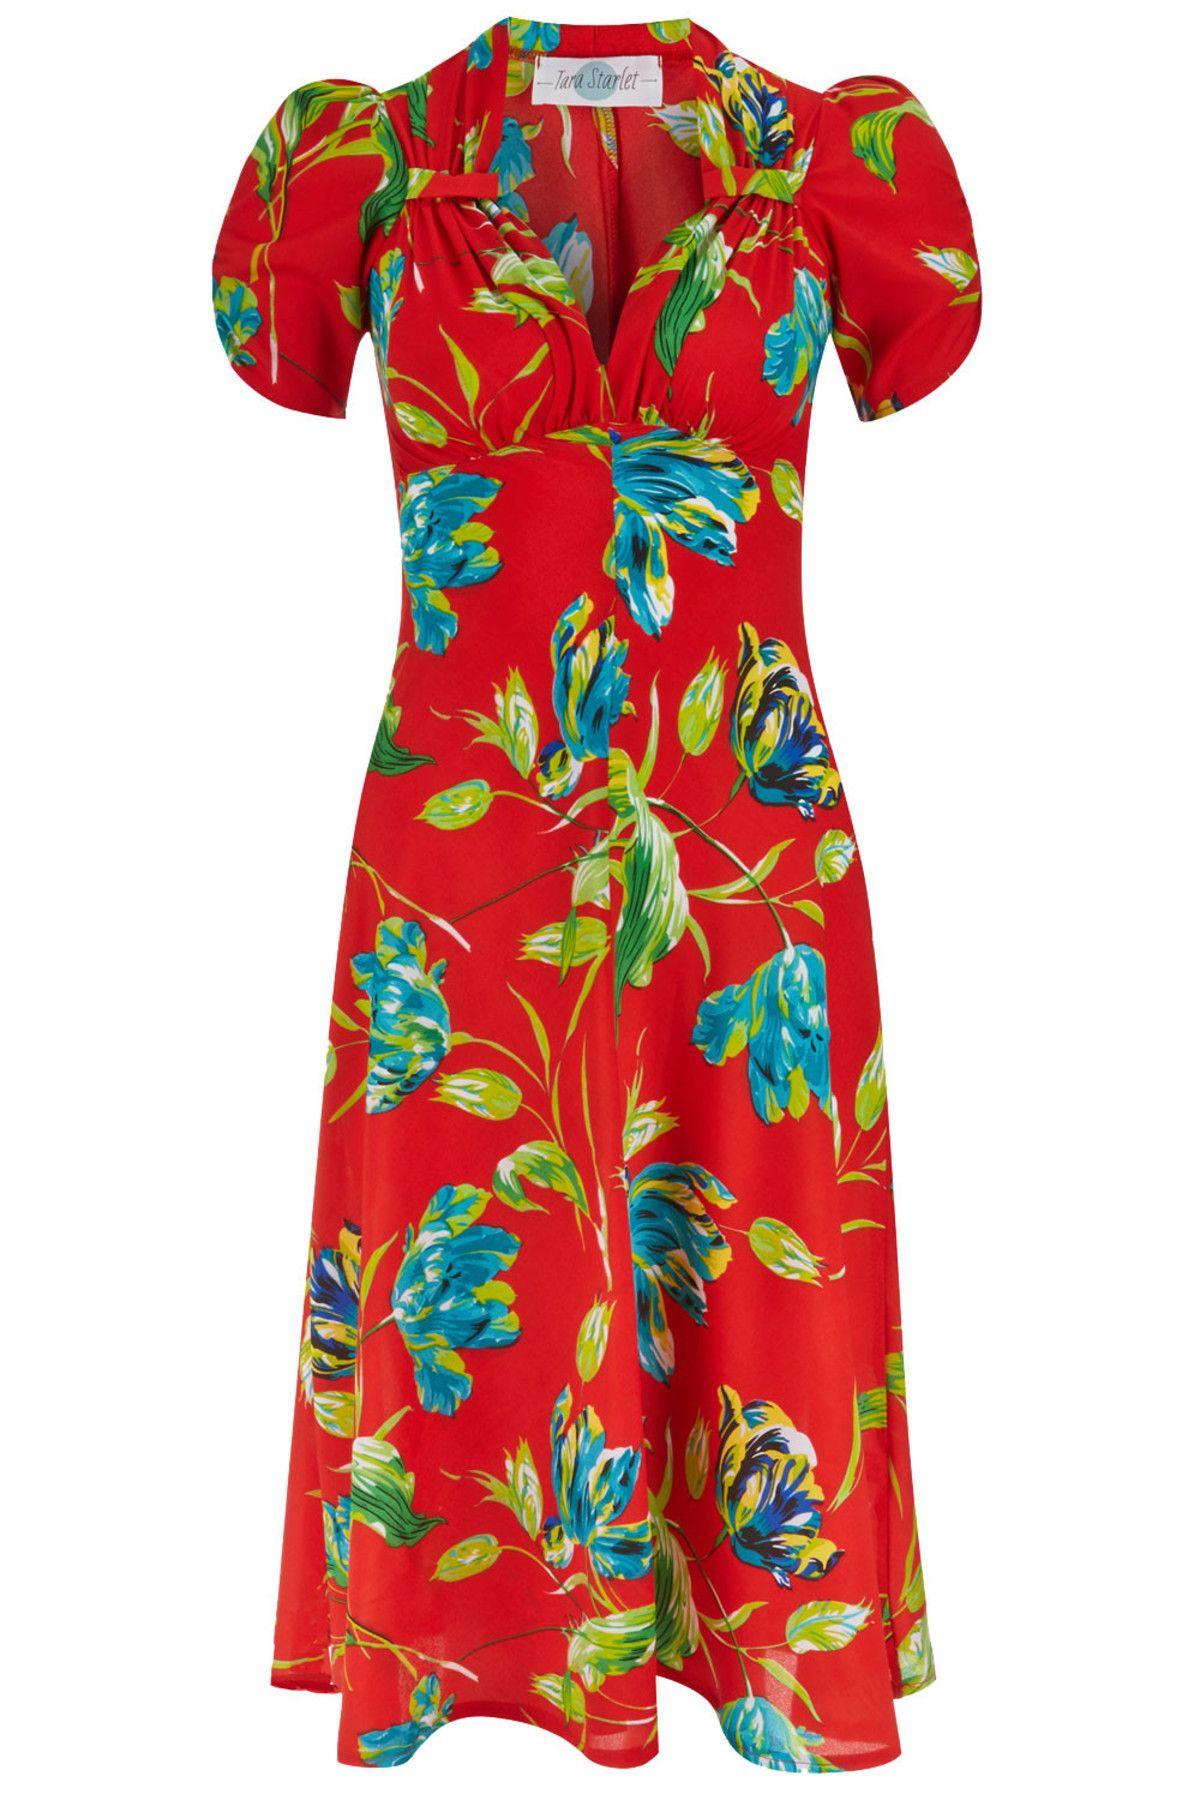 Tara Starlet 1940s 40s Style: Tara Starlet The Floral Sweetheart Dress